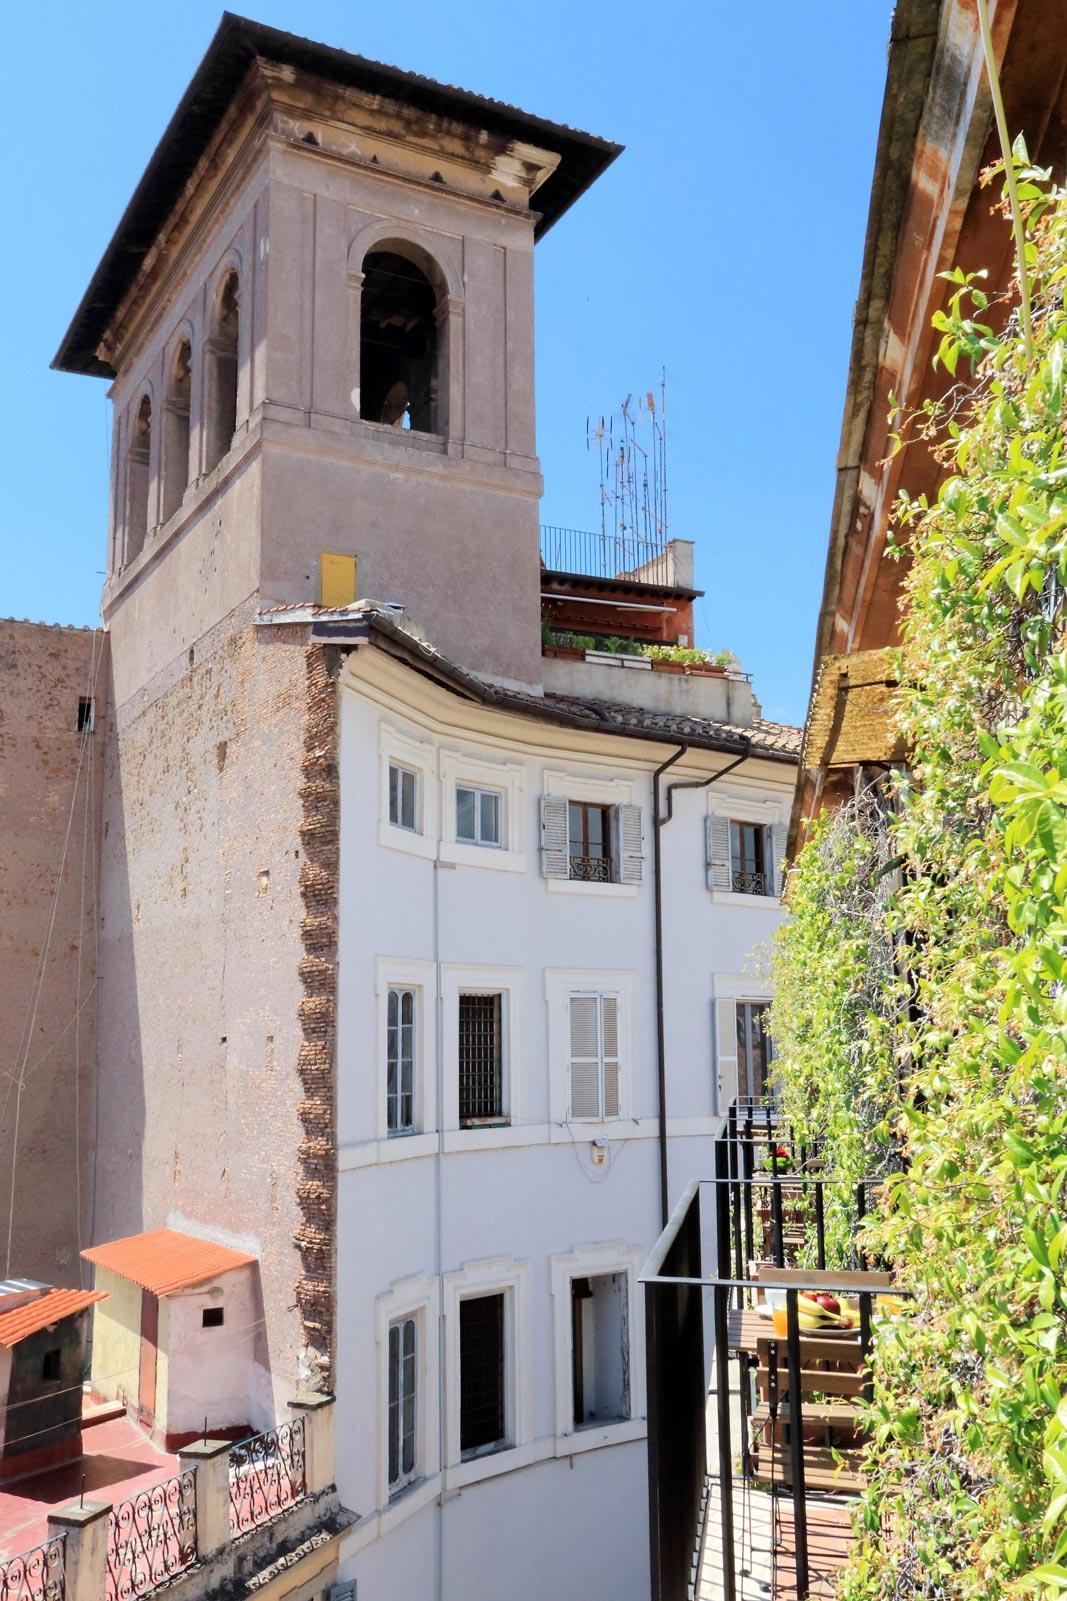 B&B Terrazze Navona Rome